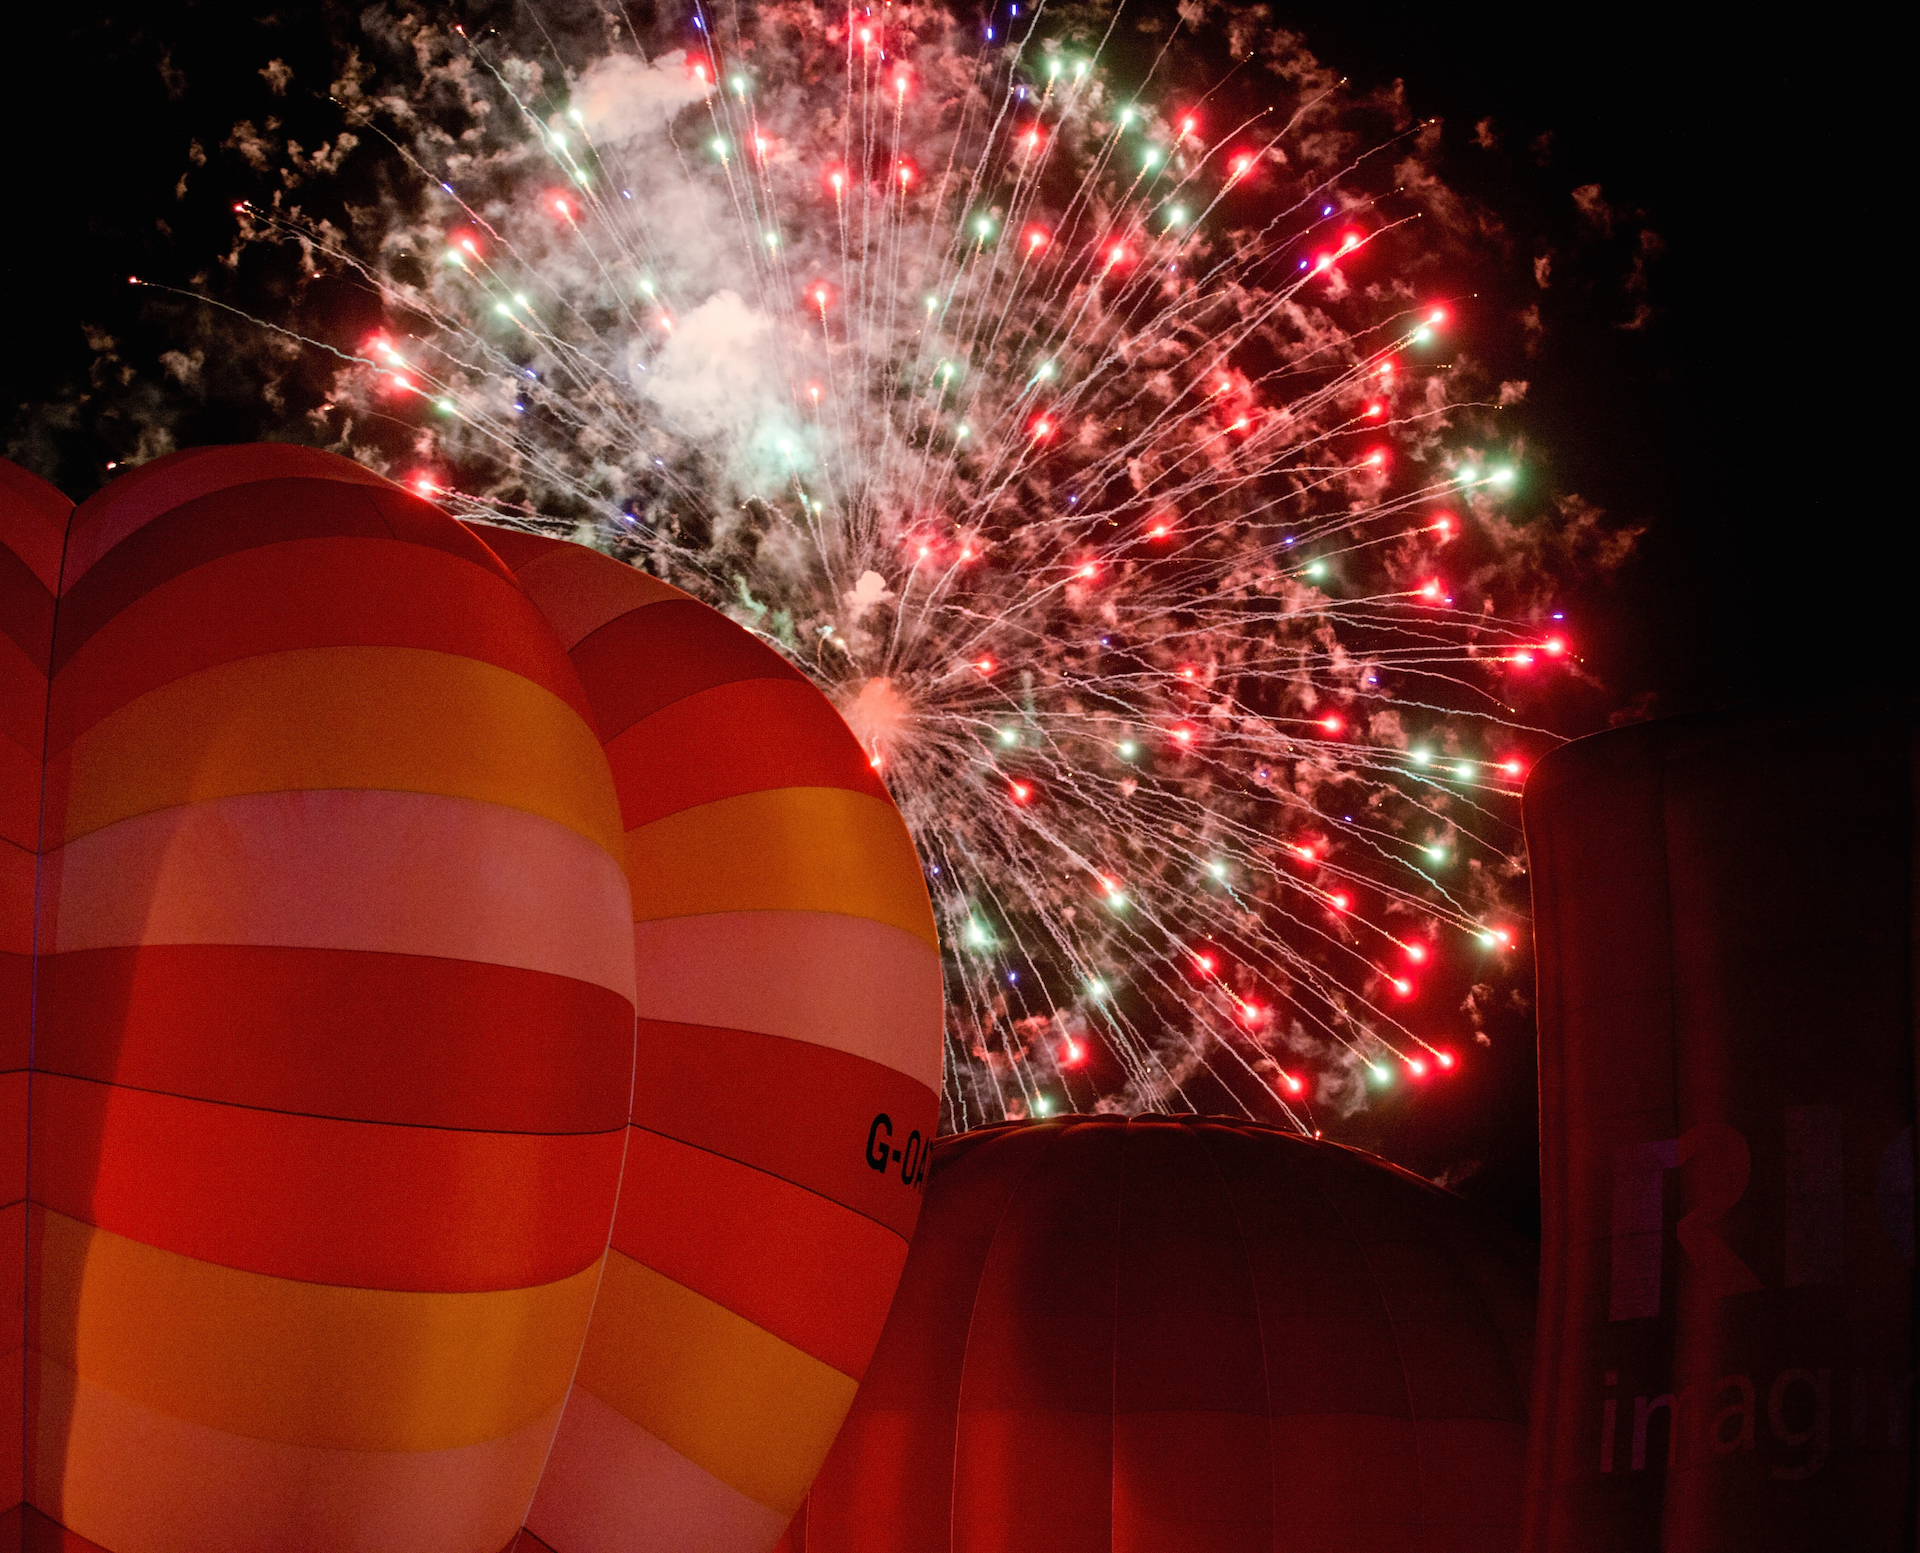 C_balloon festival